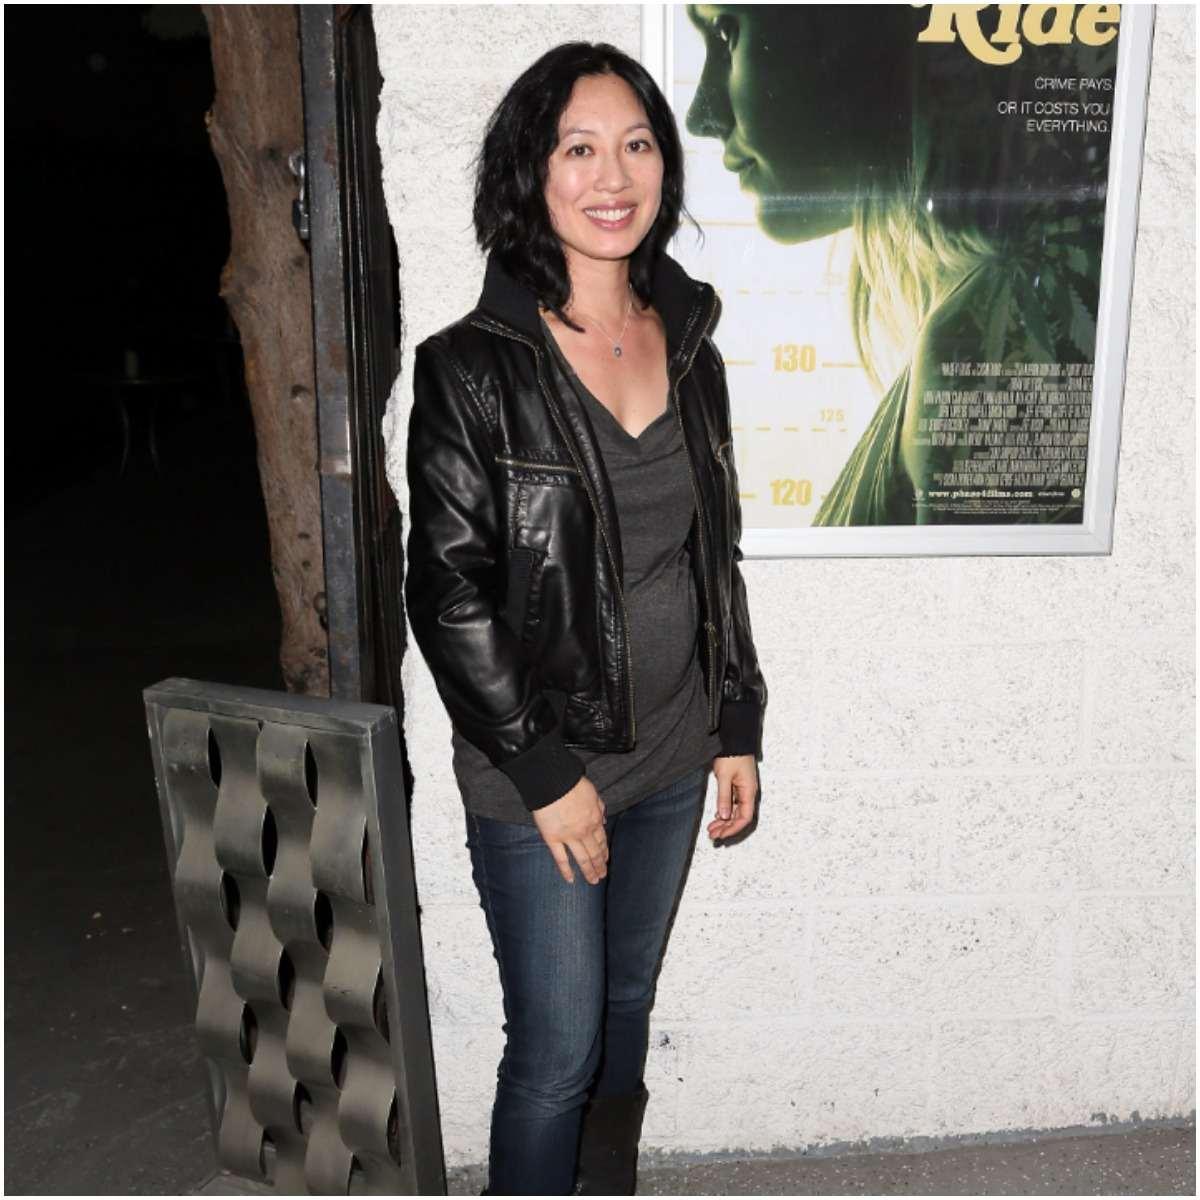 Quyen Tran, wife of Sam Riegel